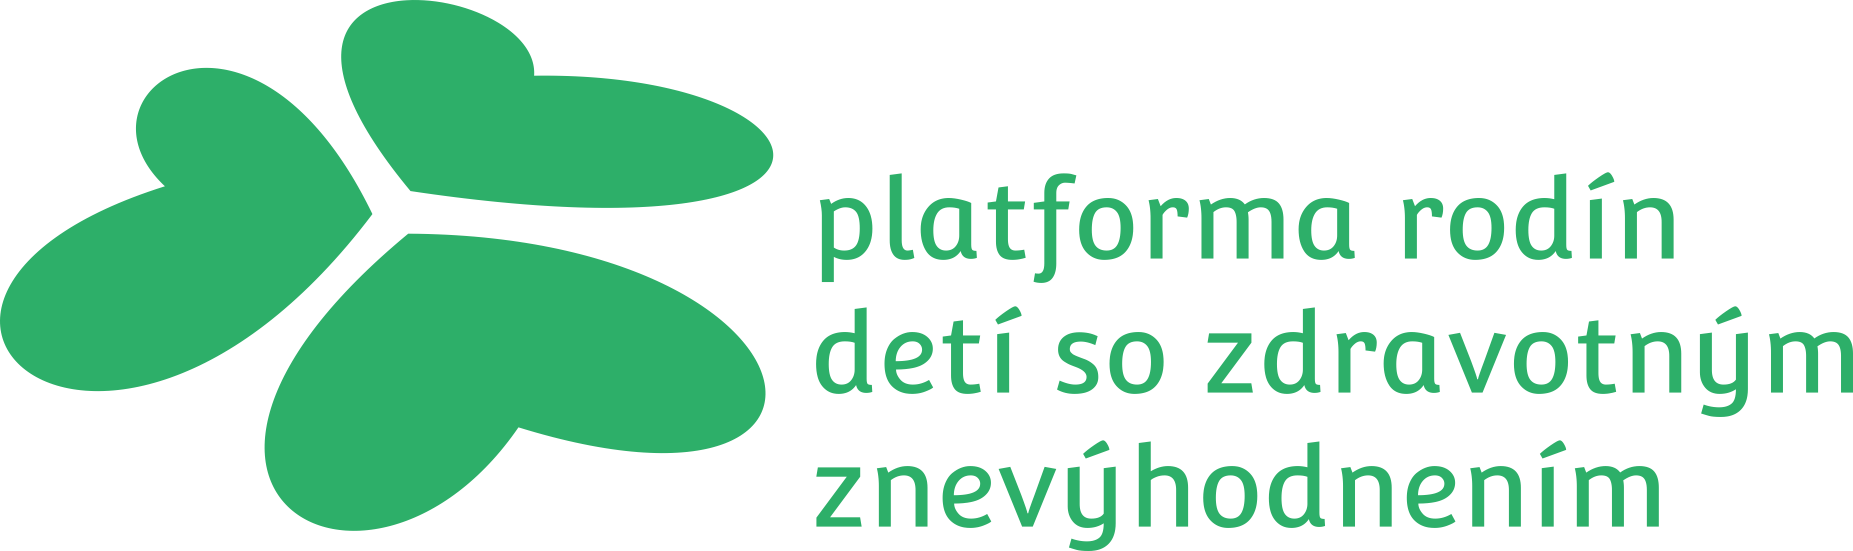 Platforma rodín detí so zdravotným znevýhodnením